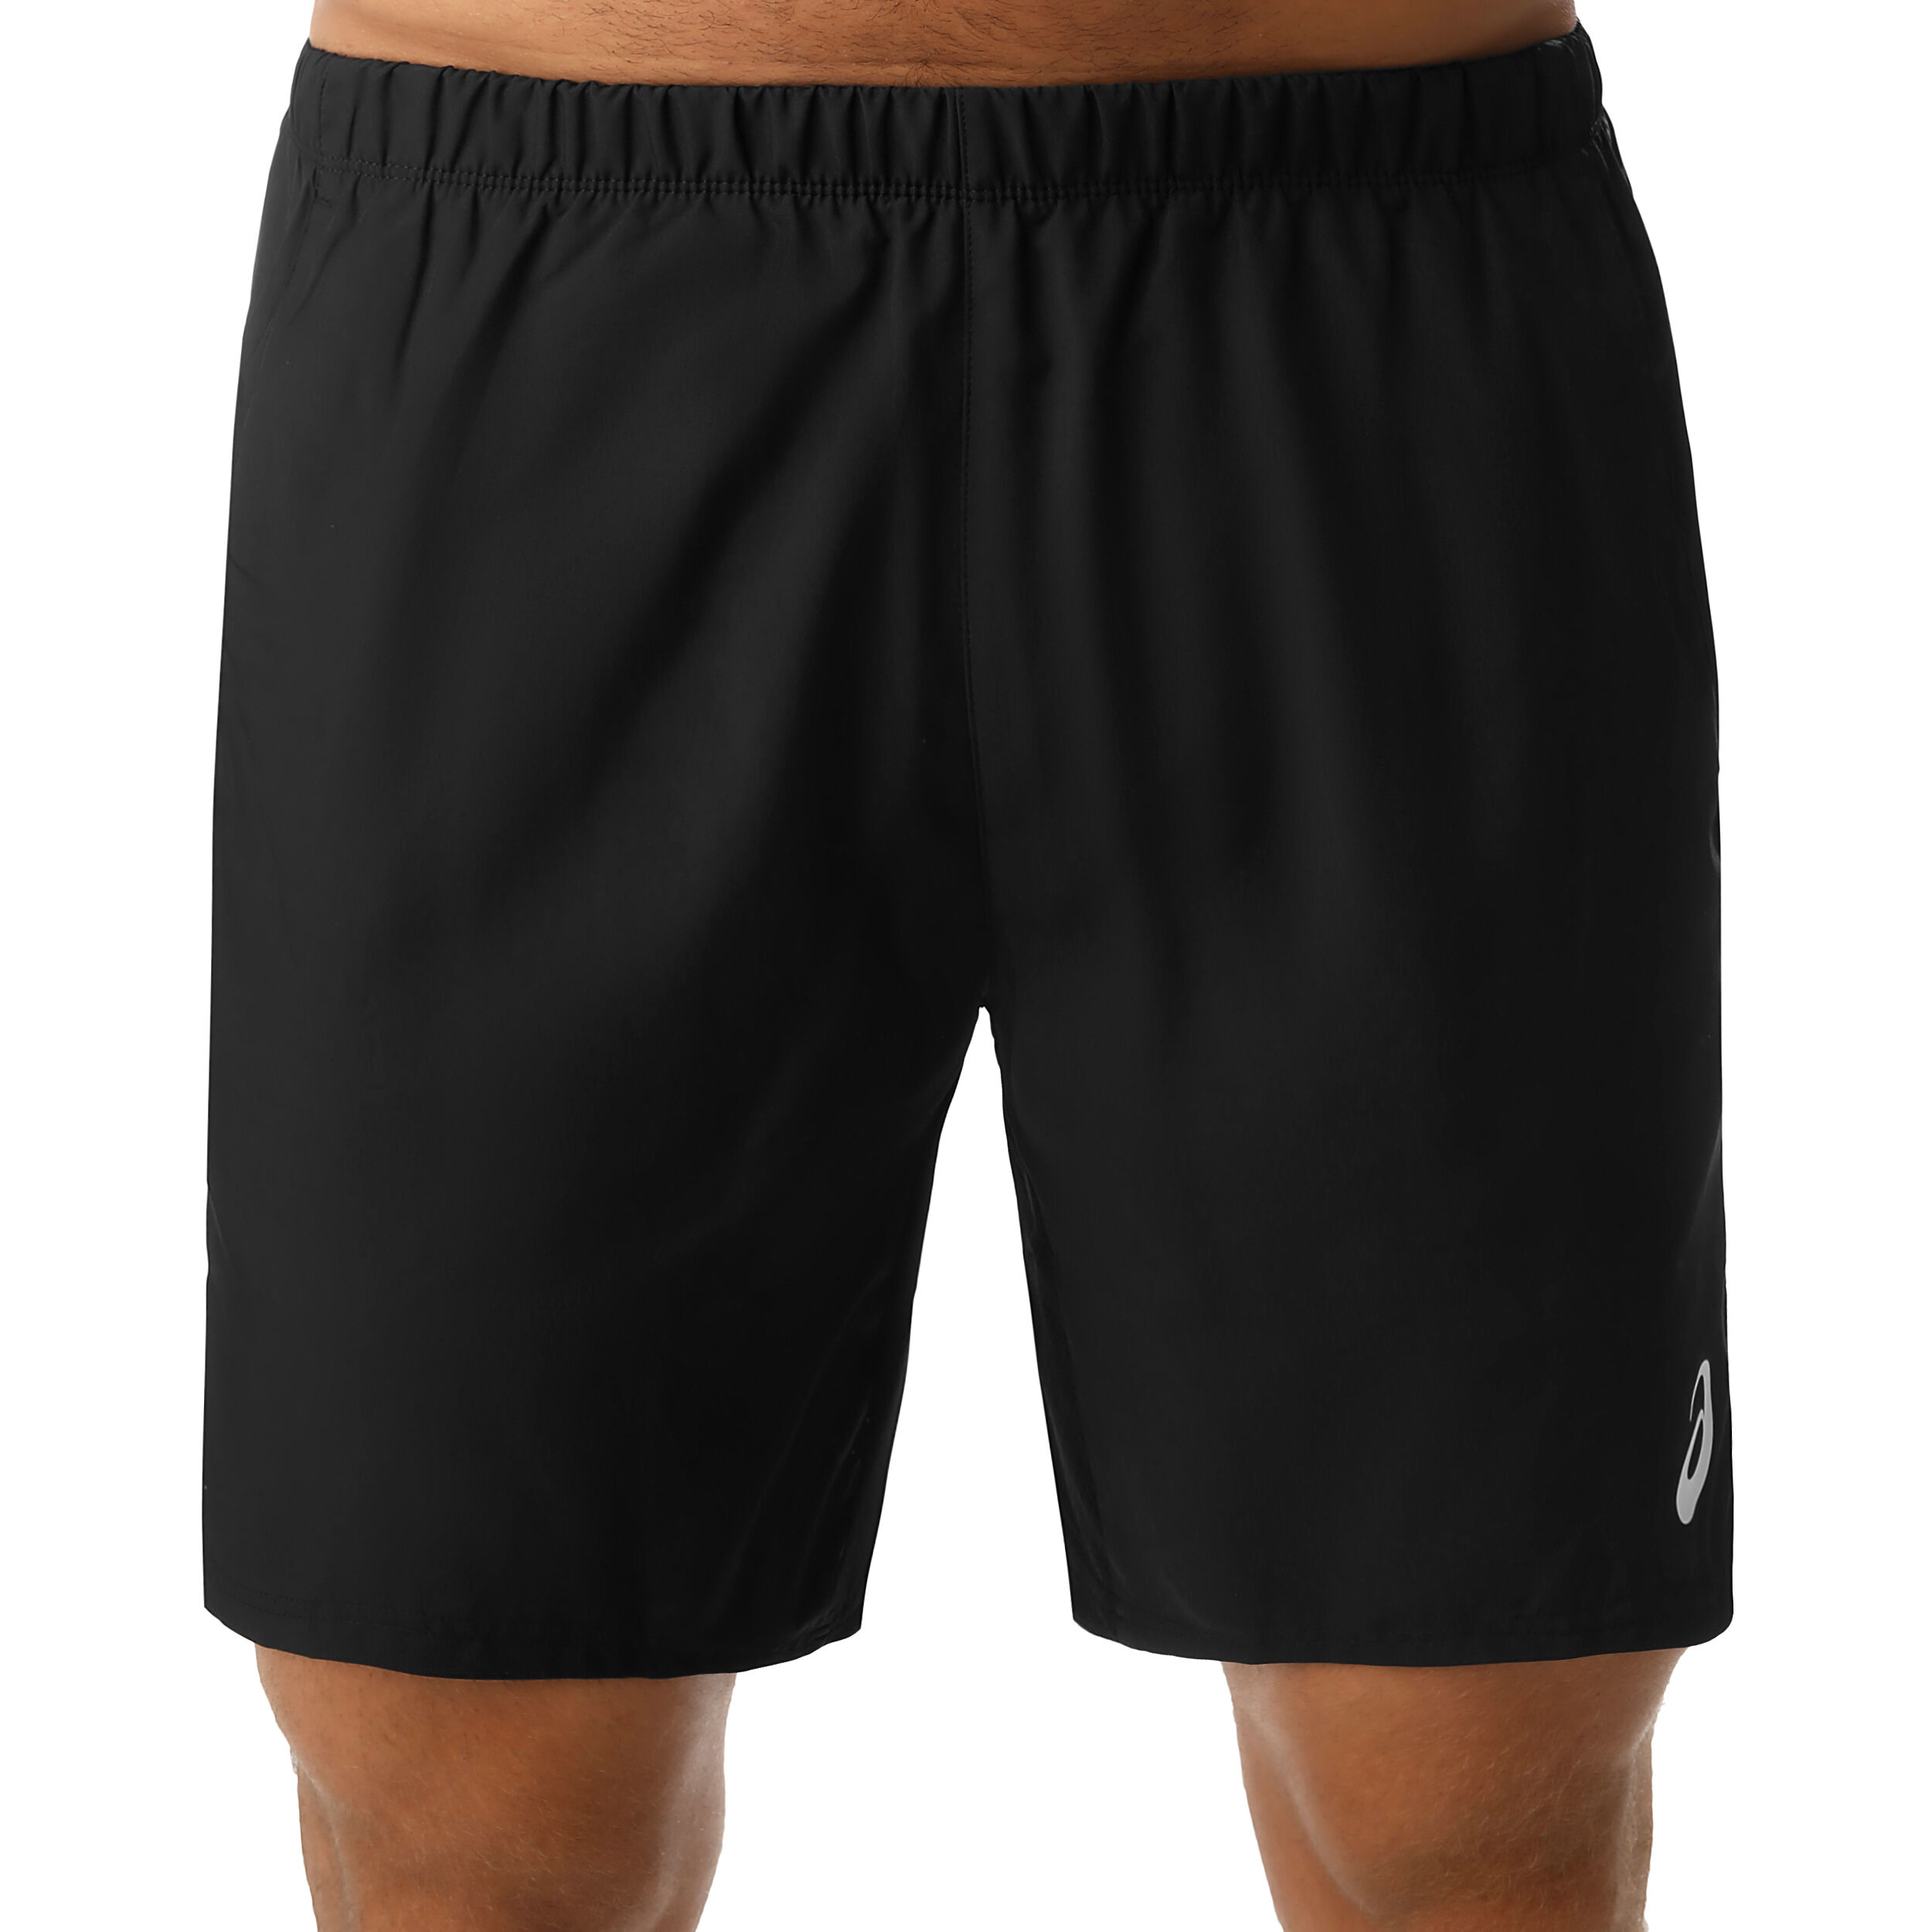 Asics 7in Shorts Herrar Vit, Svart köp online | Tennis Point